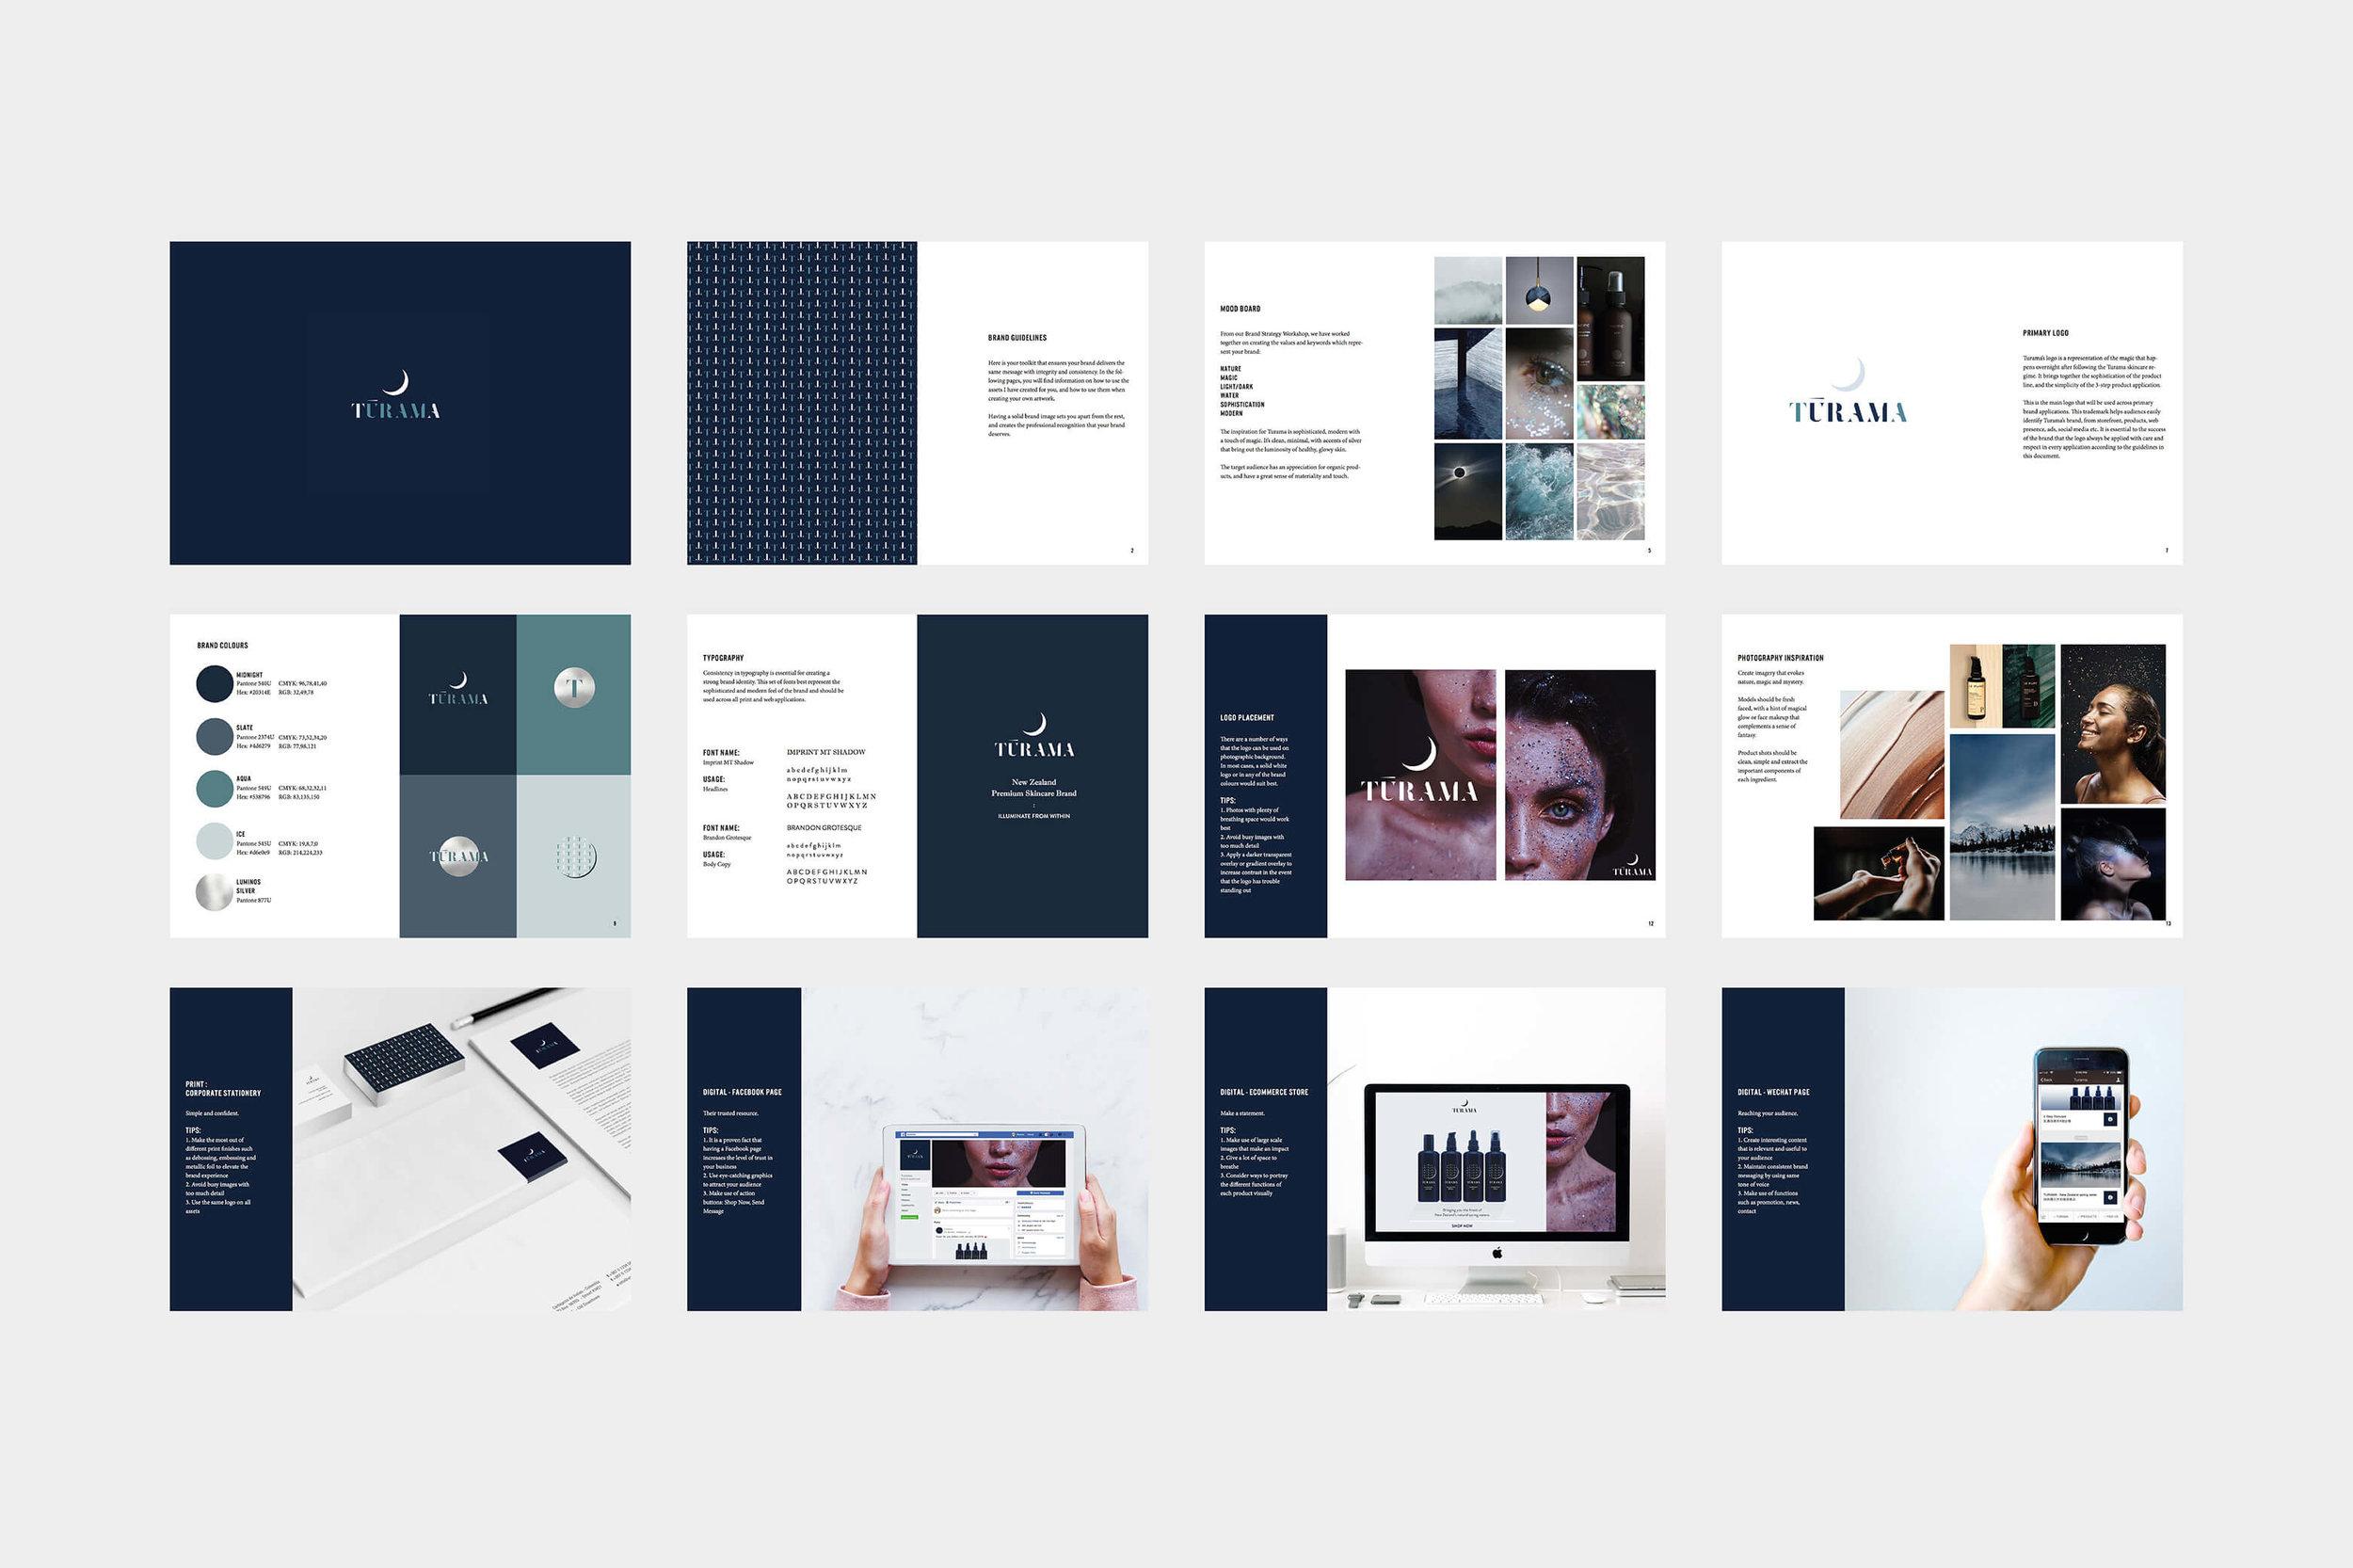 Turama_Brand_Guideline-07_op.jpg